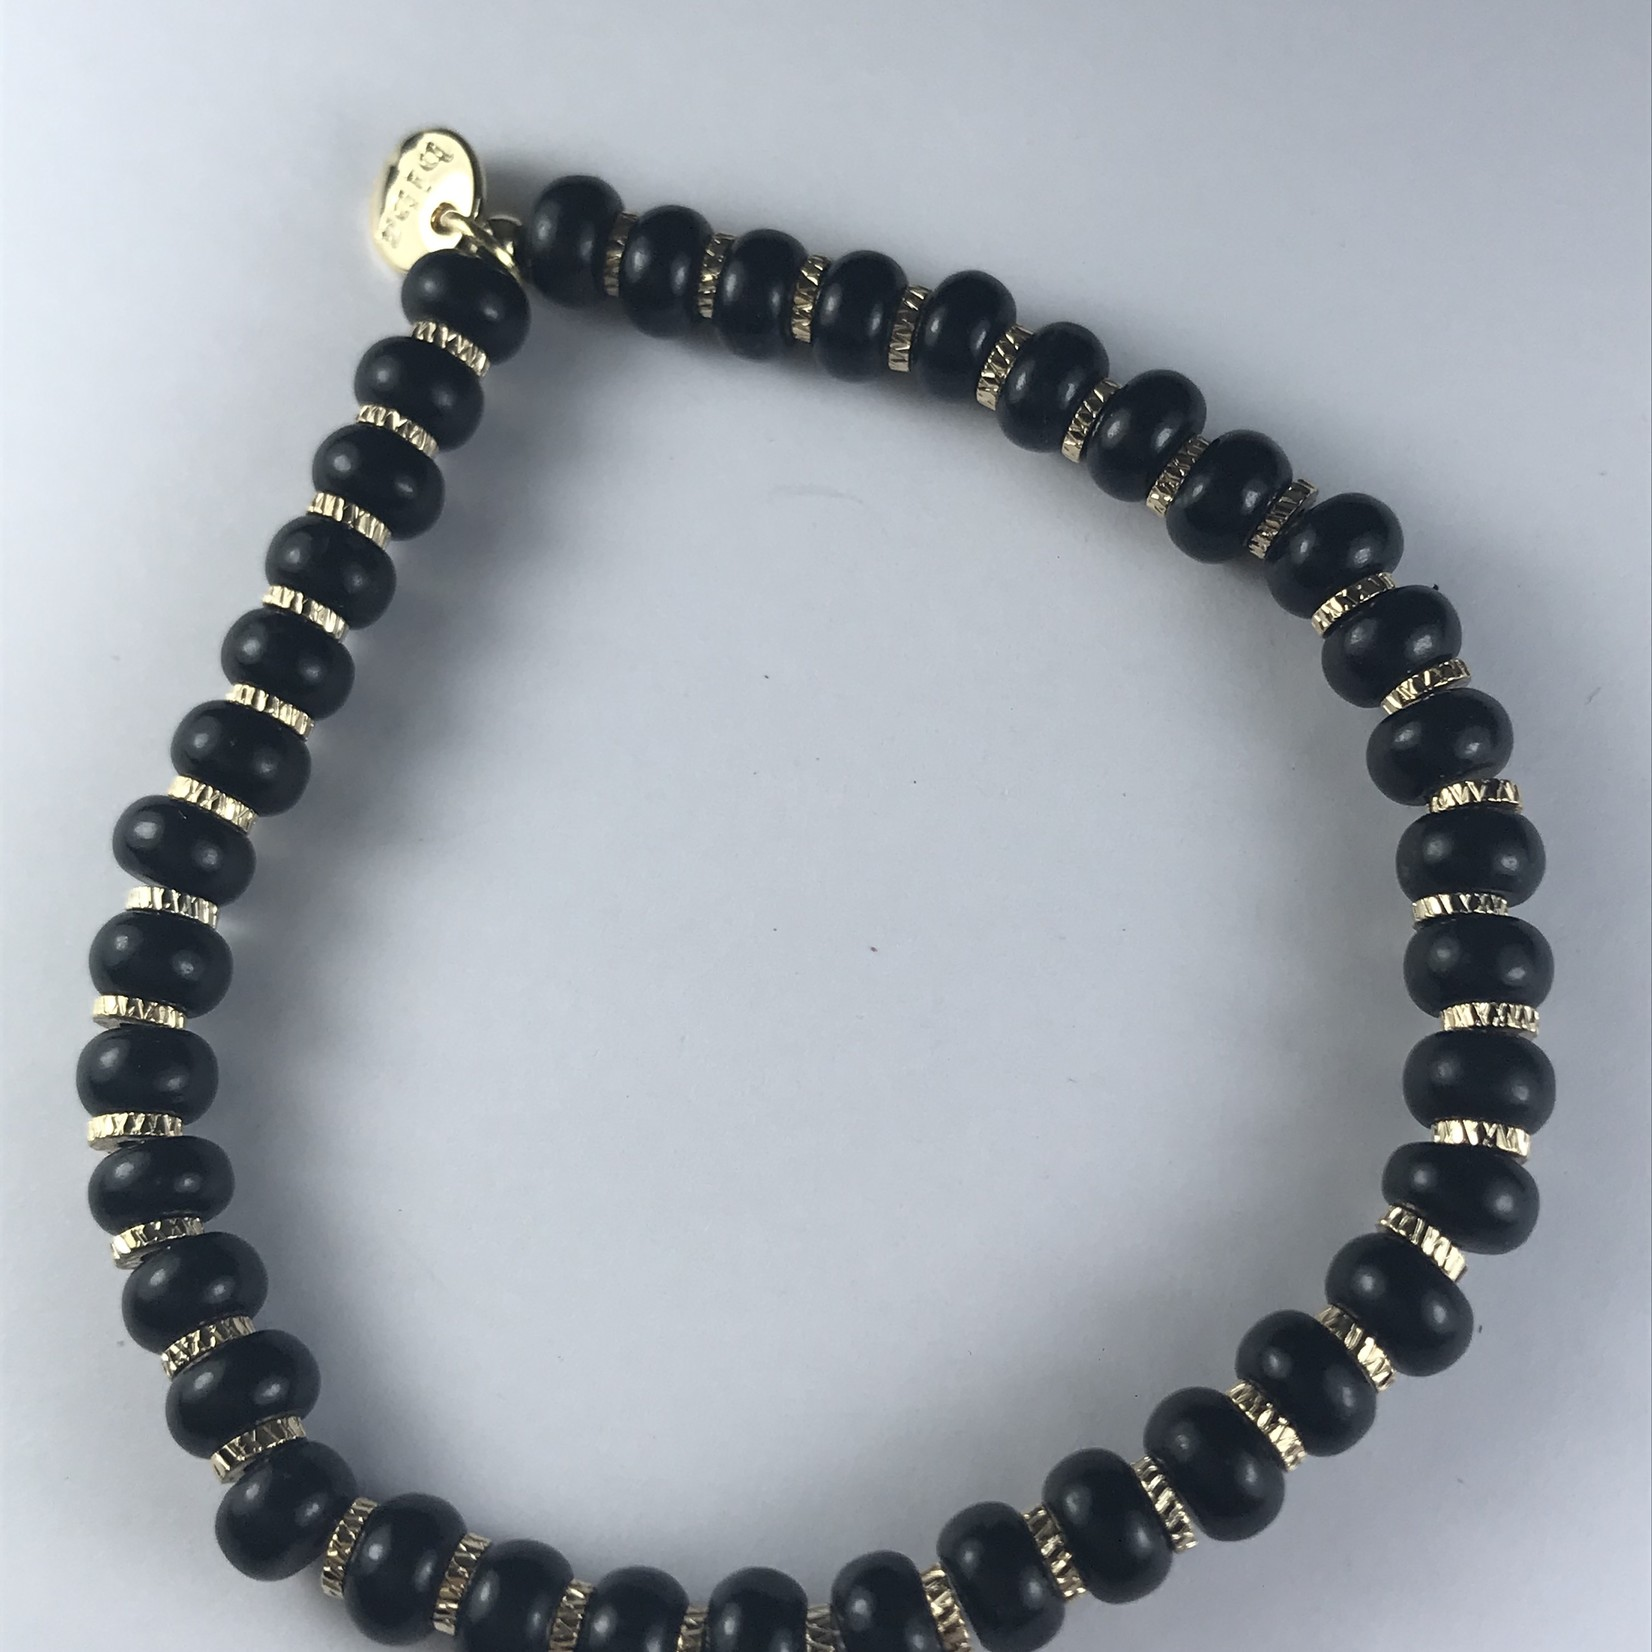 Biba stevige armband - zwarte kralen op fijne gouden armband